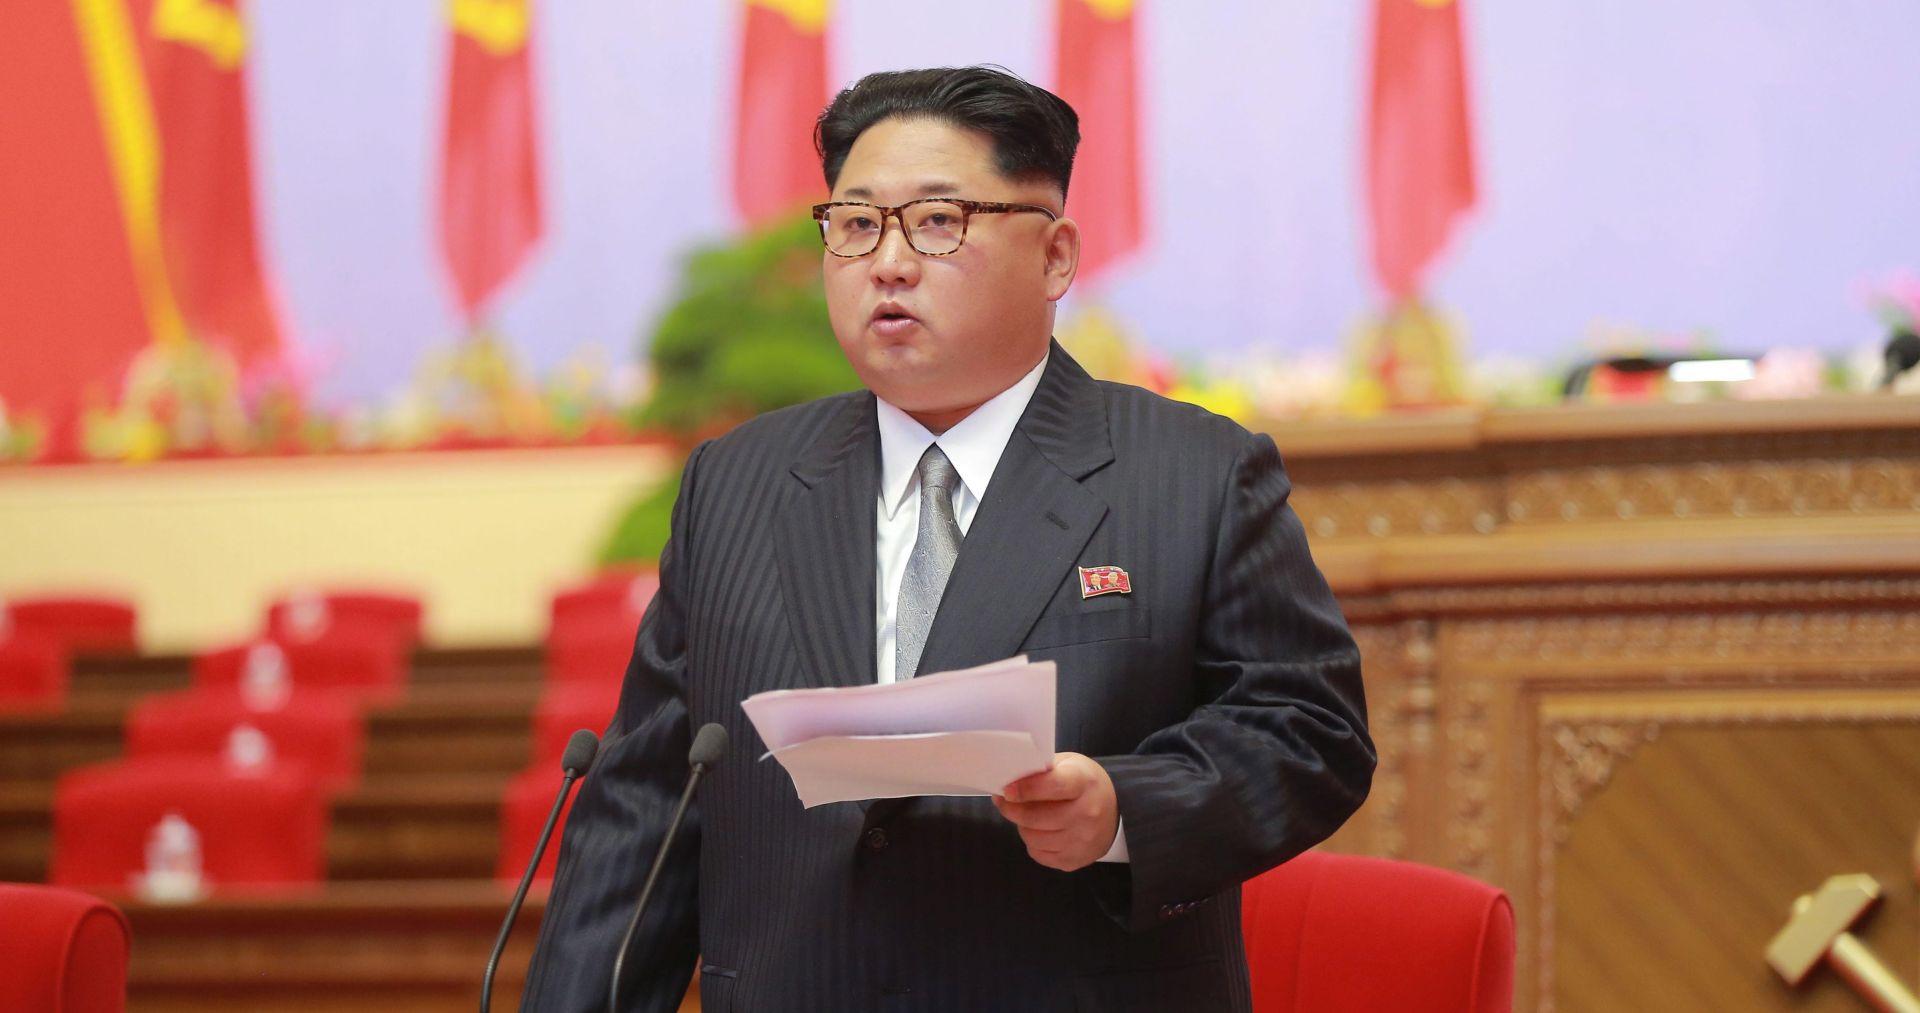 Sjeverna Koreja navodno priprema novi nuklearni pokus